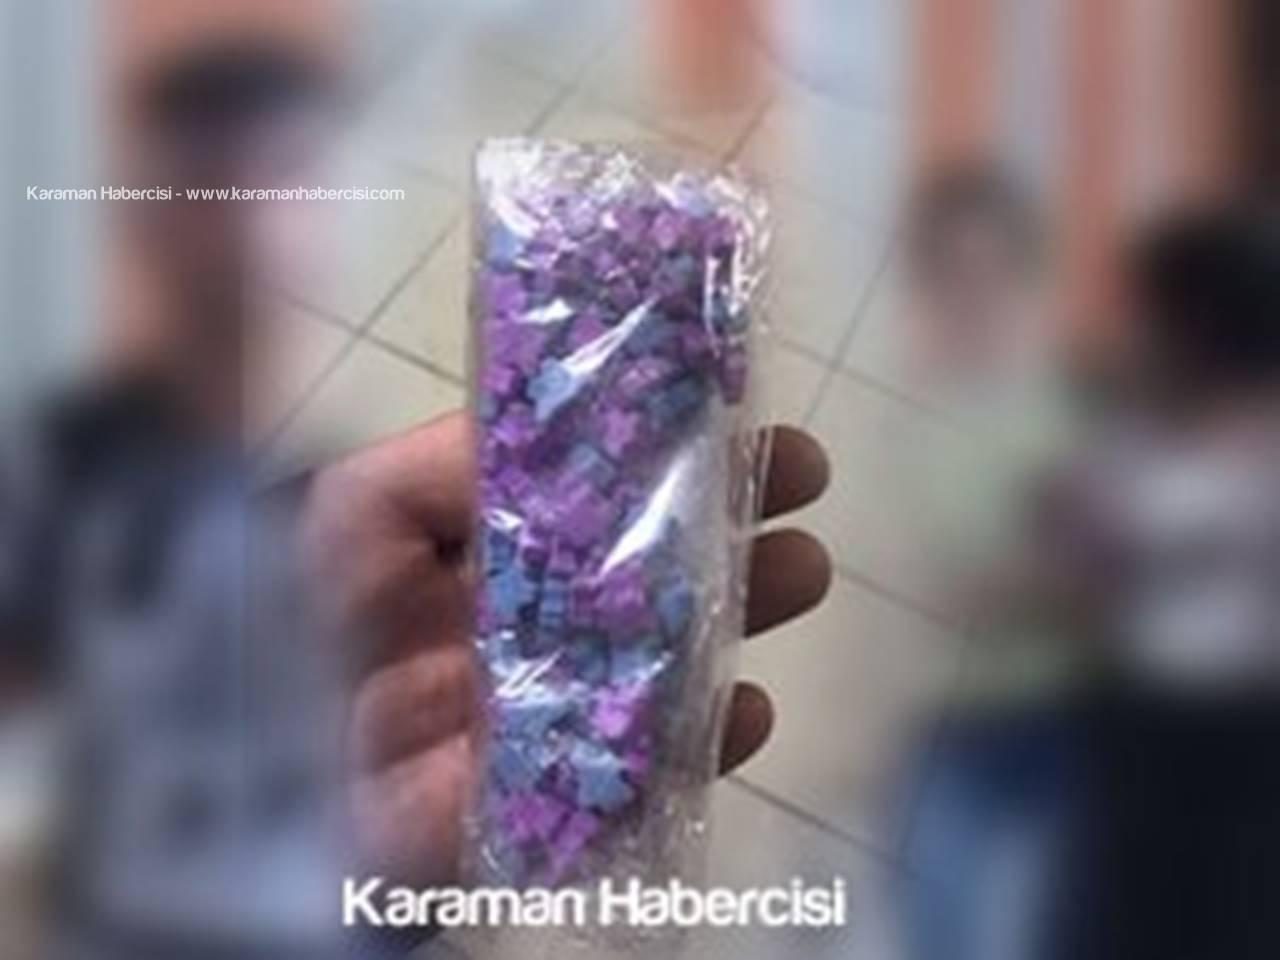 Karaman'da Zehir Tacirlerine Operasyon